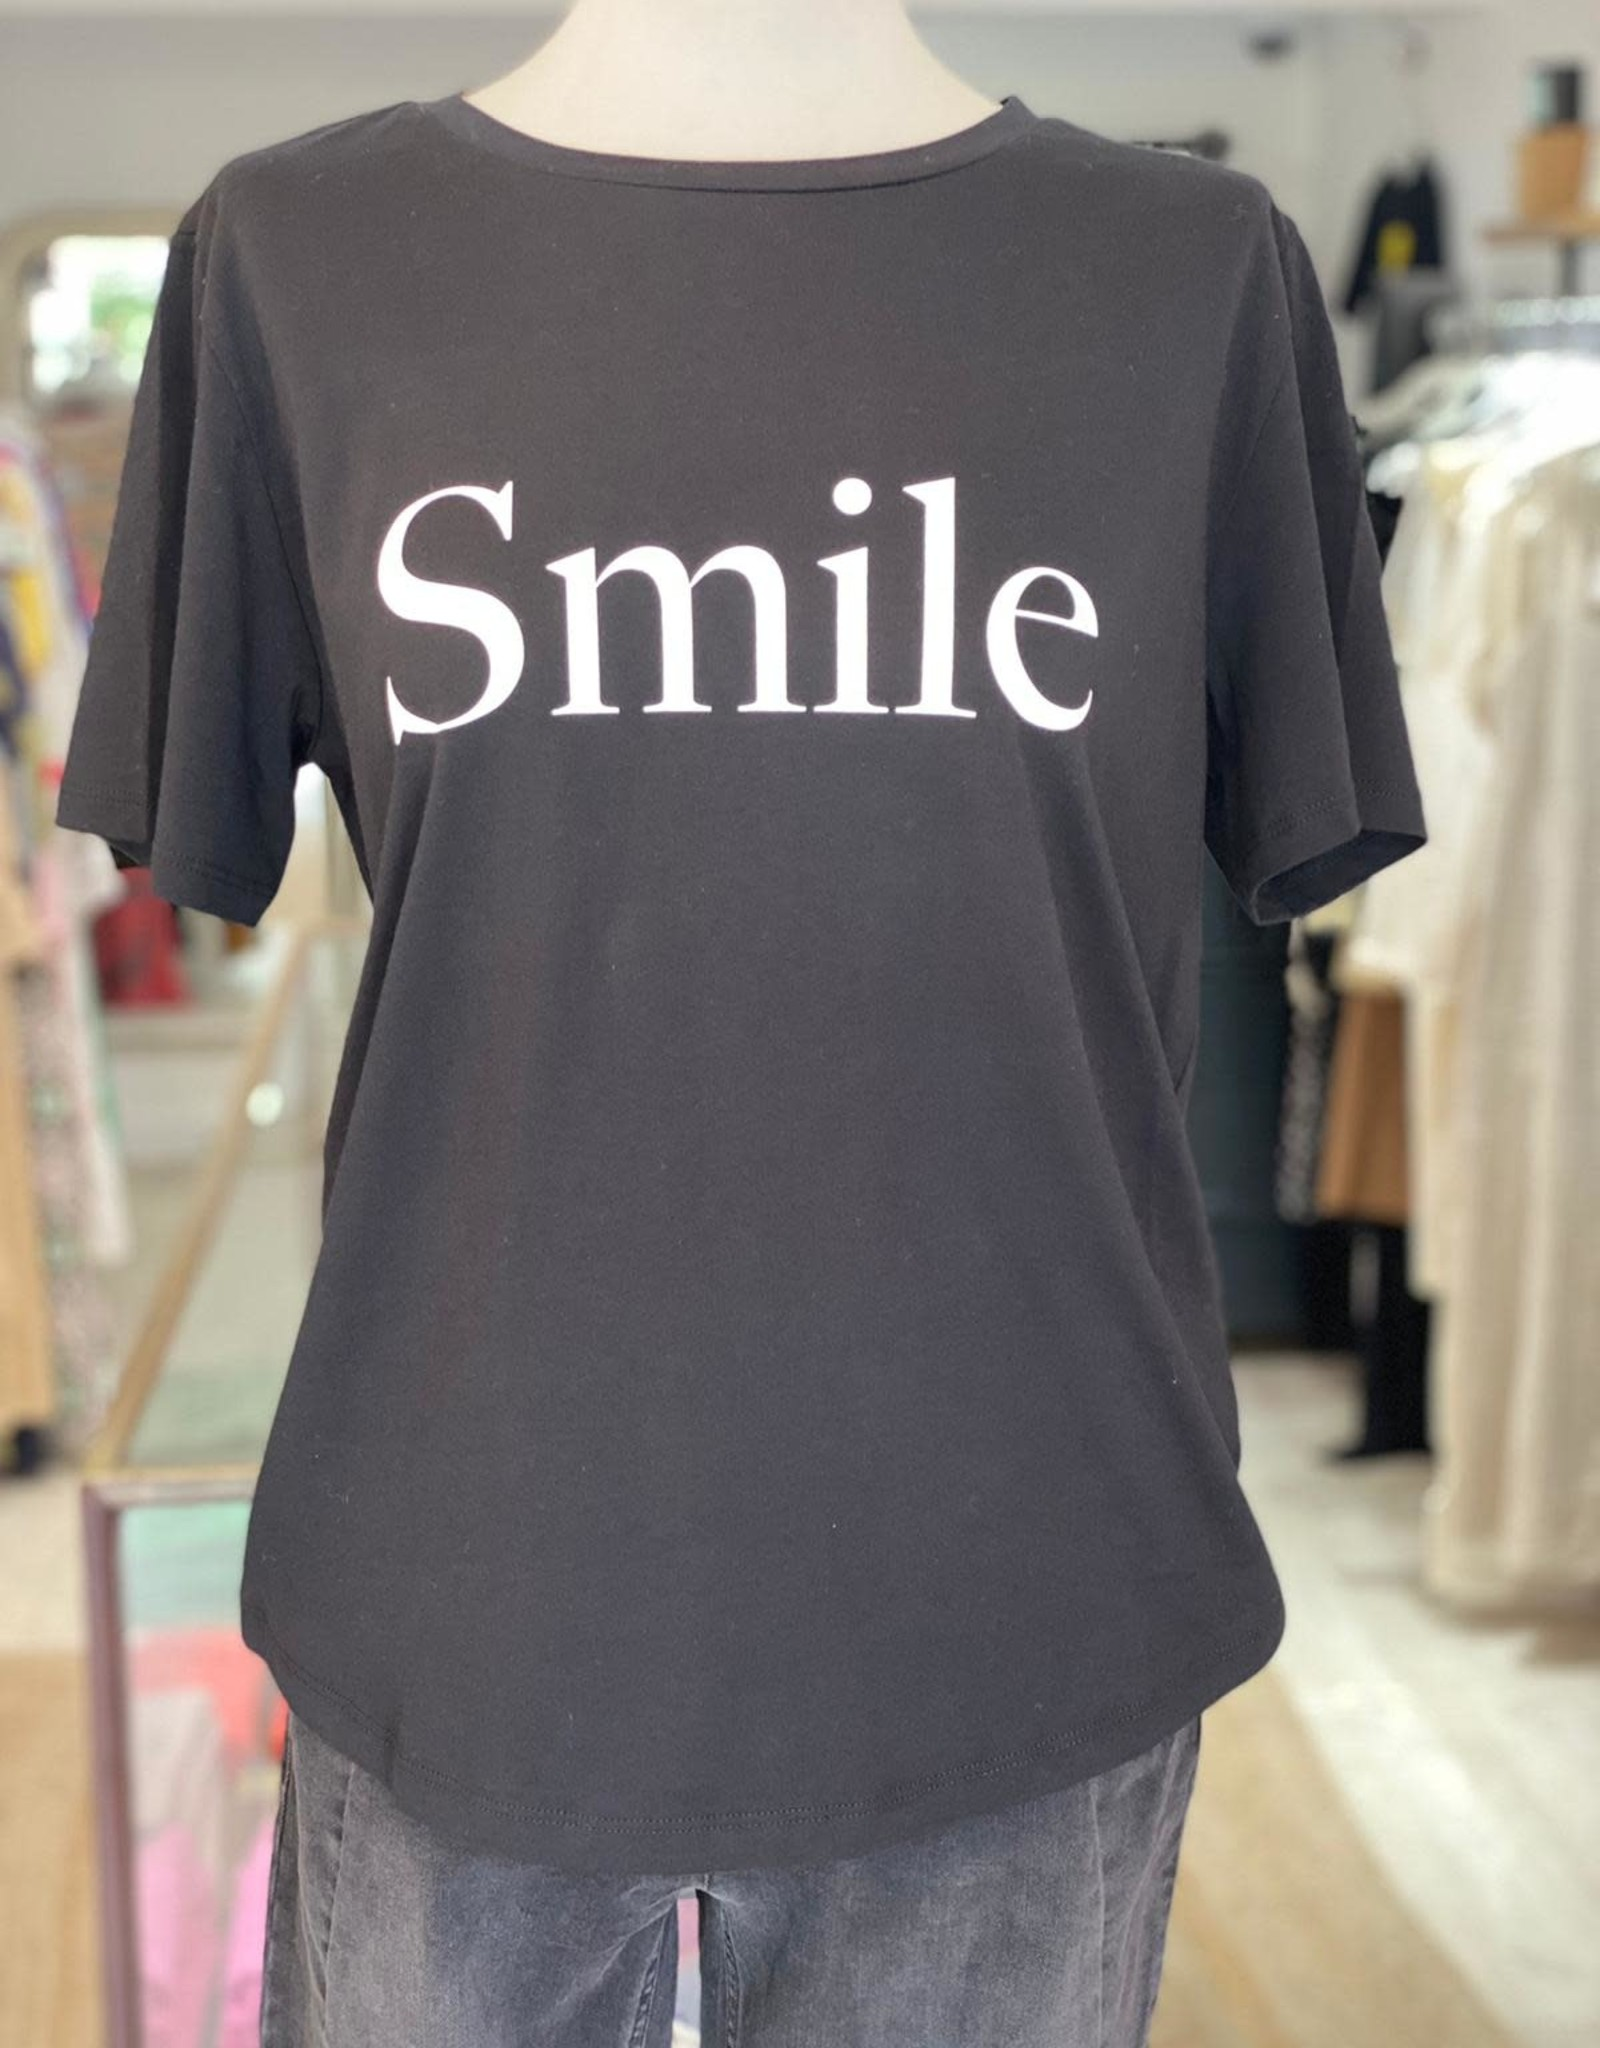 SOUTH PARADE LOLA BLACK SMILE